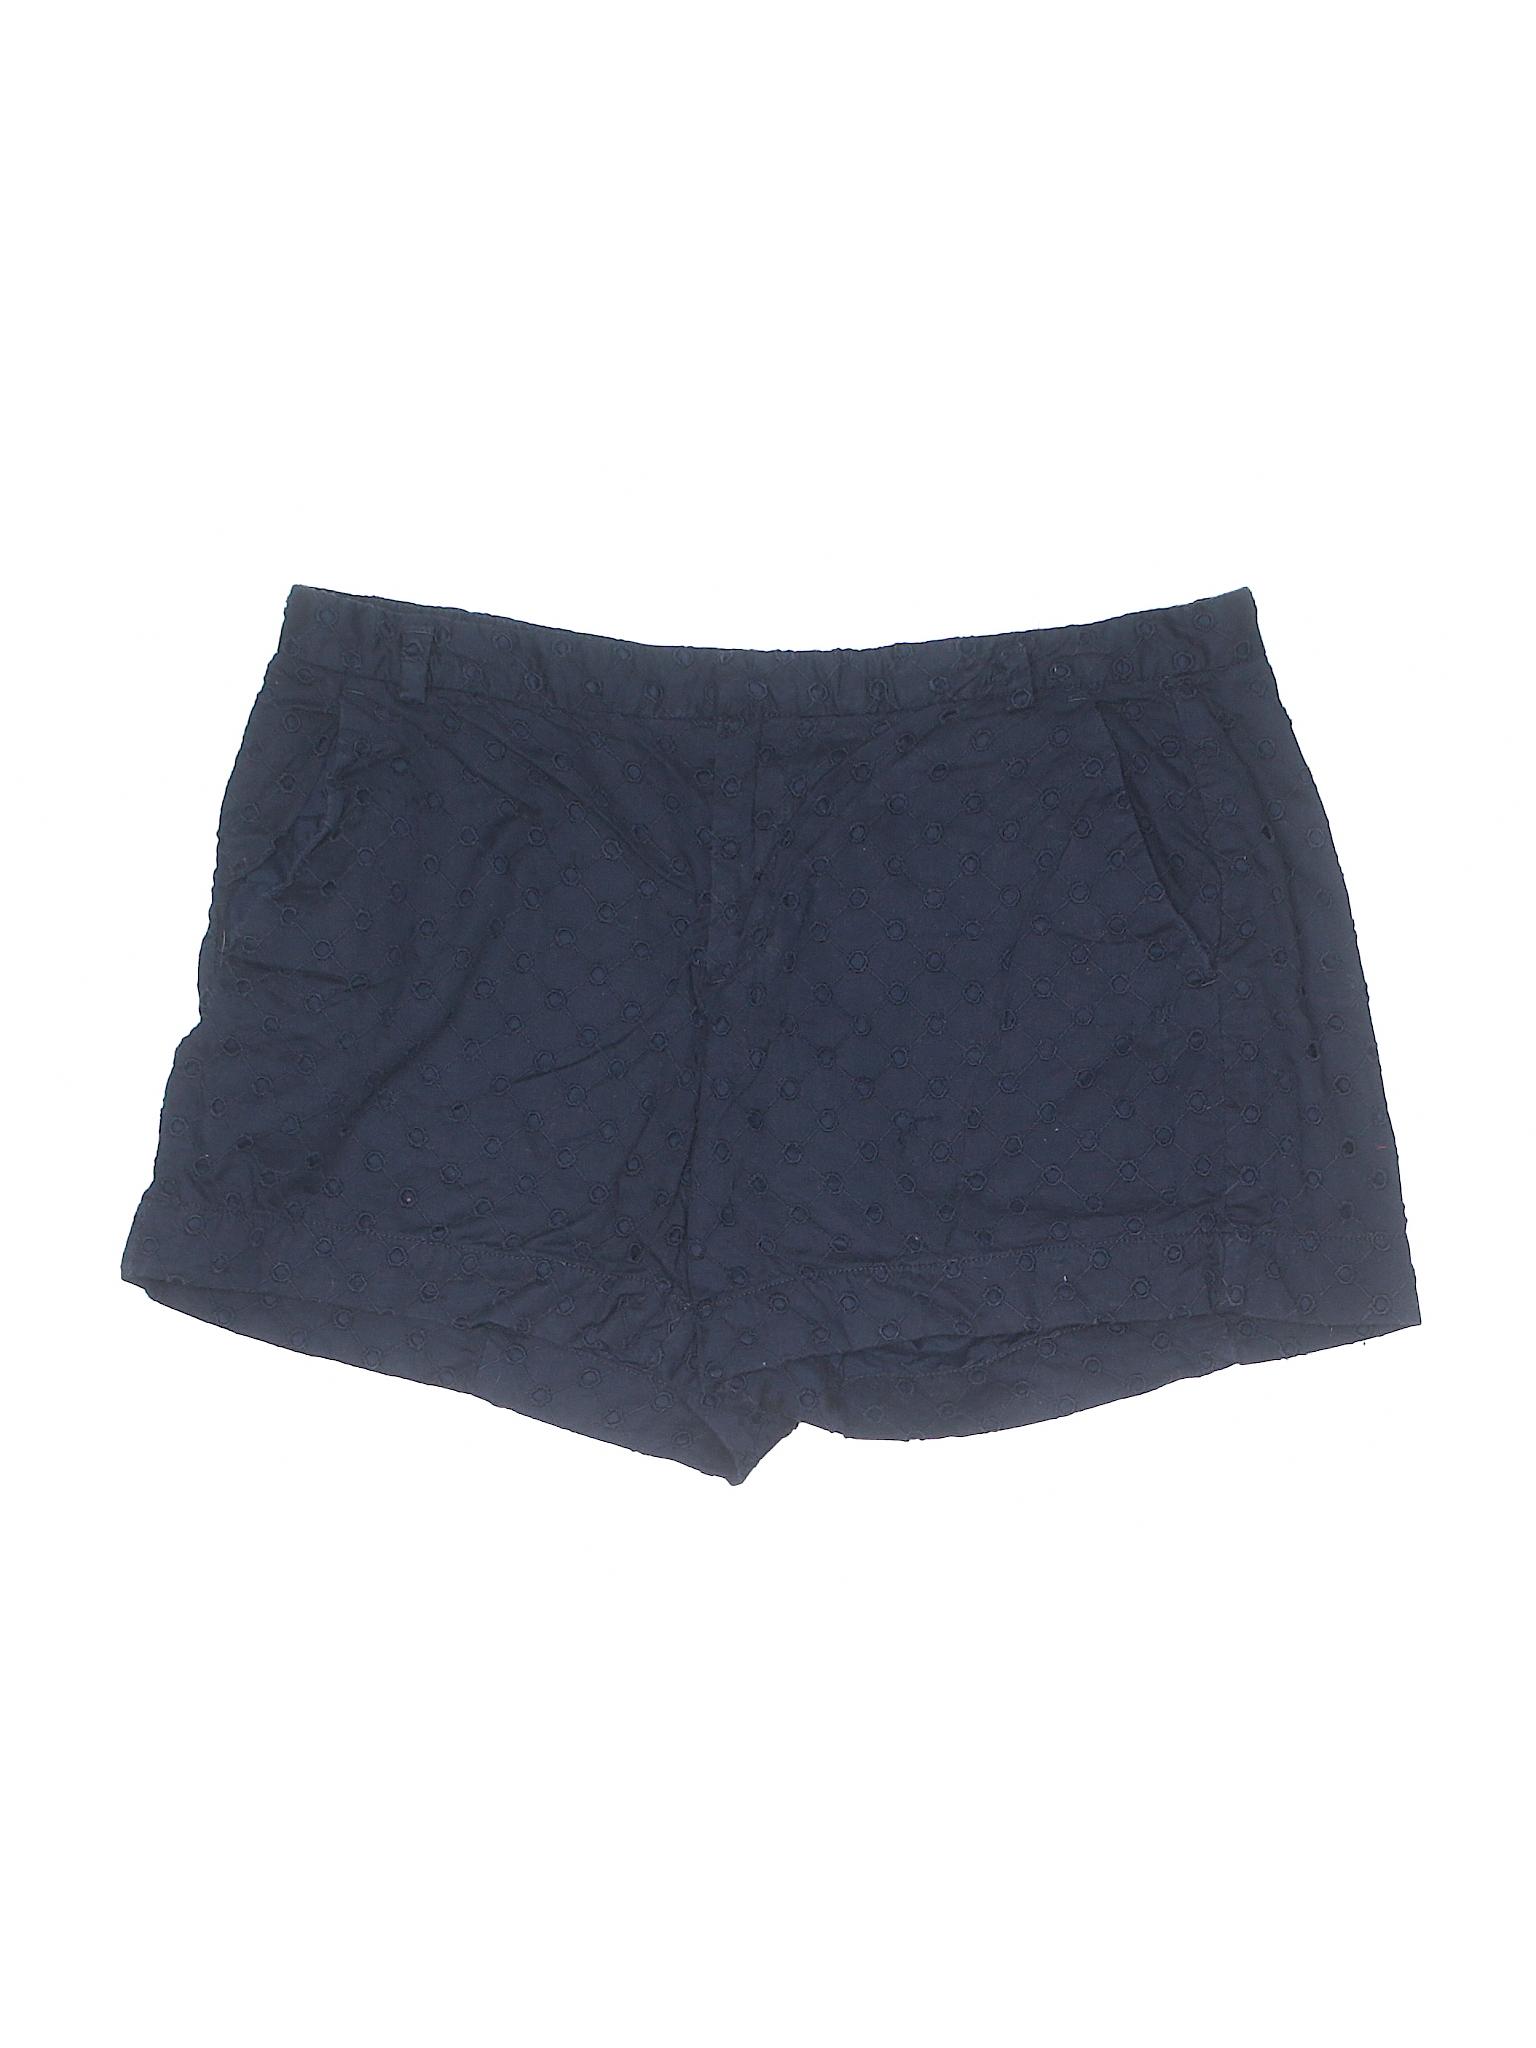 Dressy Boutique Shorts Gap Boutique Shorts Boutique Dressy Gap Ixn87RY